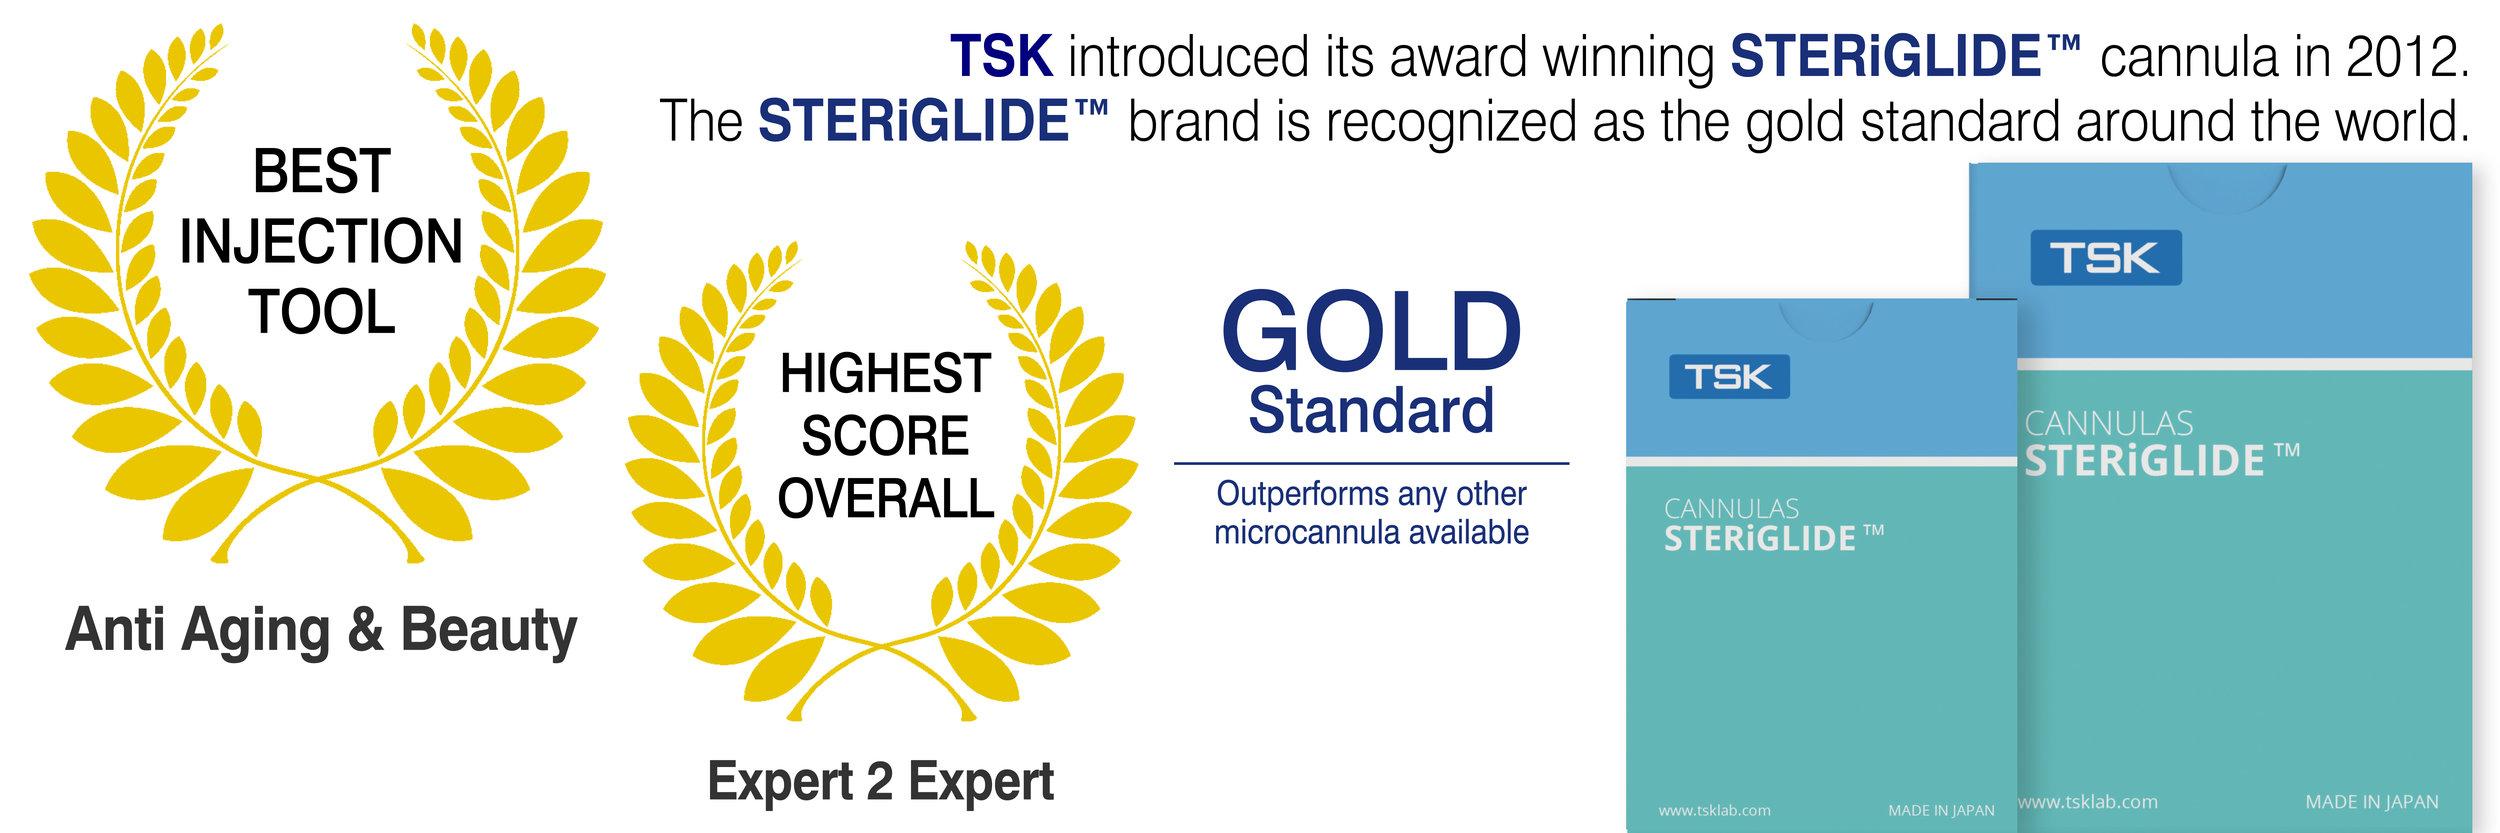 tsk-steriglide-award-winning.jpg